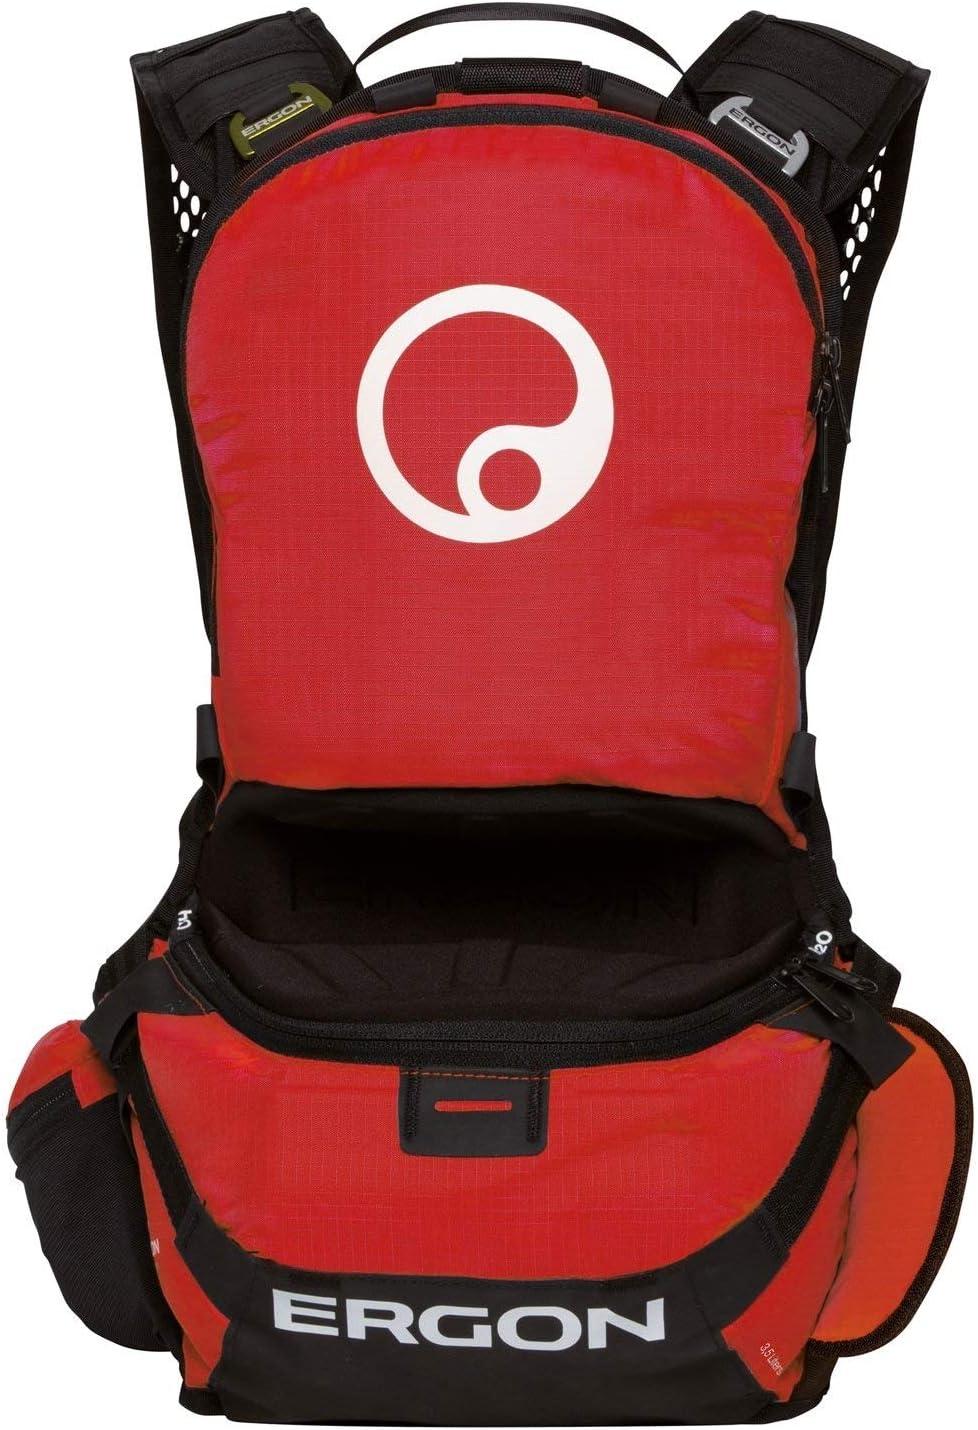 Ergon BE2 Enduro – Mochila para bicicleta negro rojo ergonómico para bicicleta de montaña fr DH FR Gravity, 4500029: Amazon.es: Deportes y aire libre